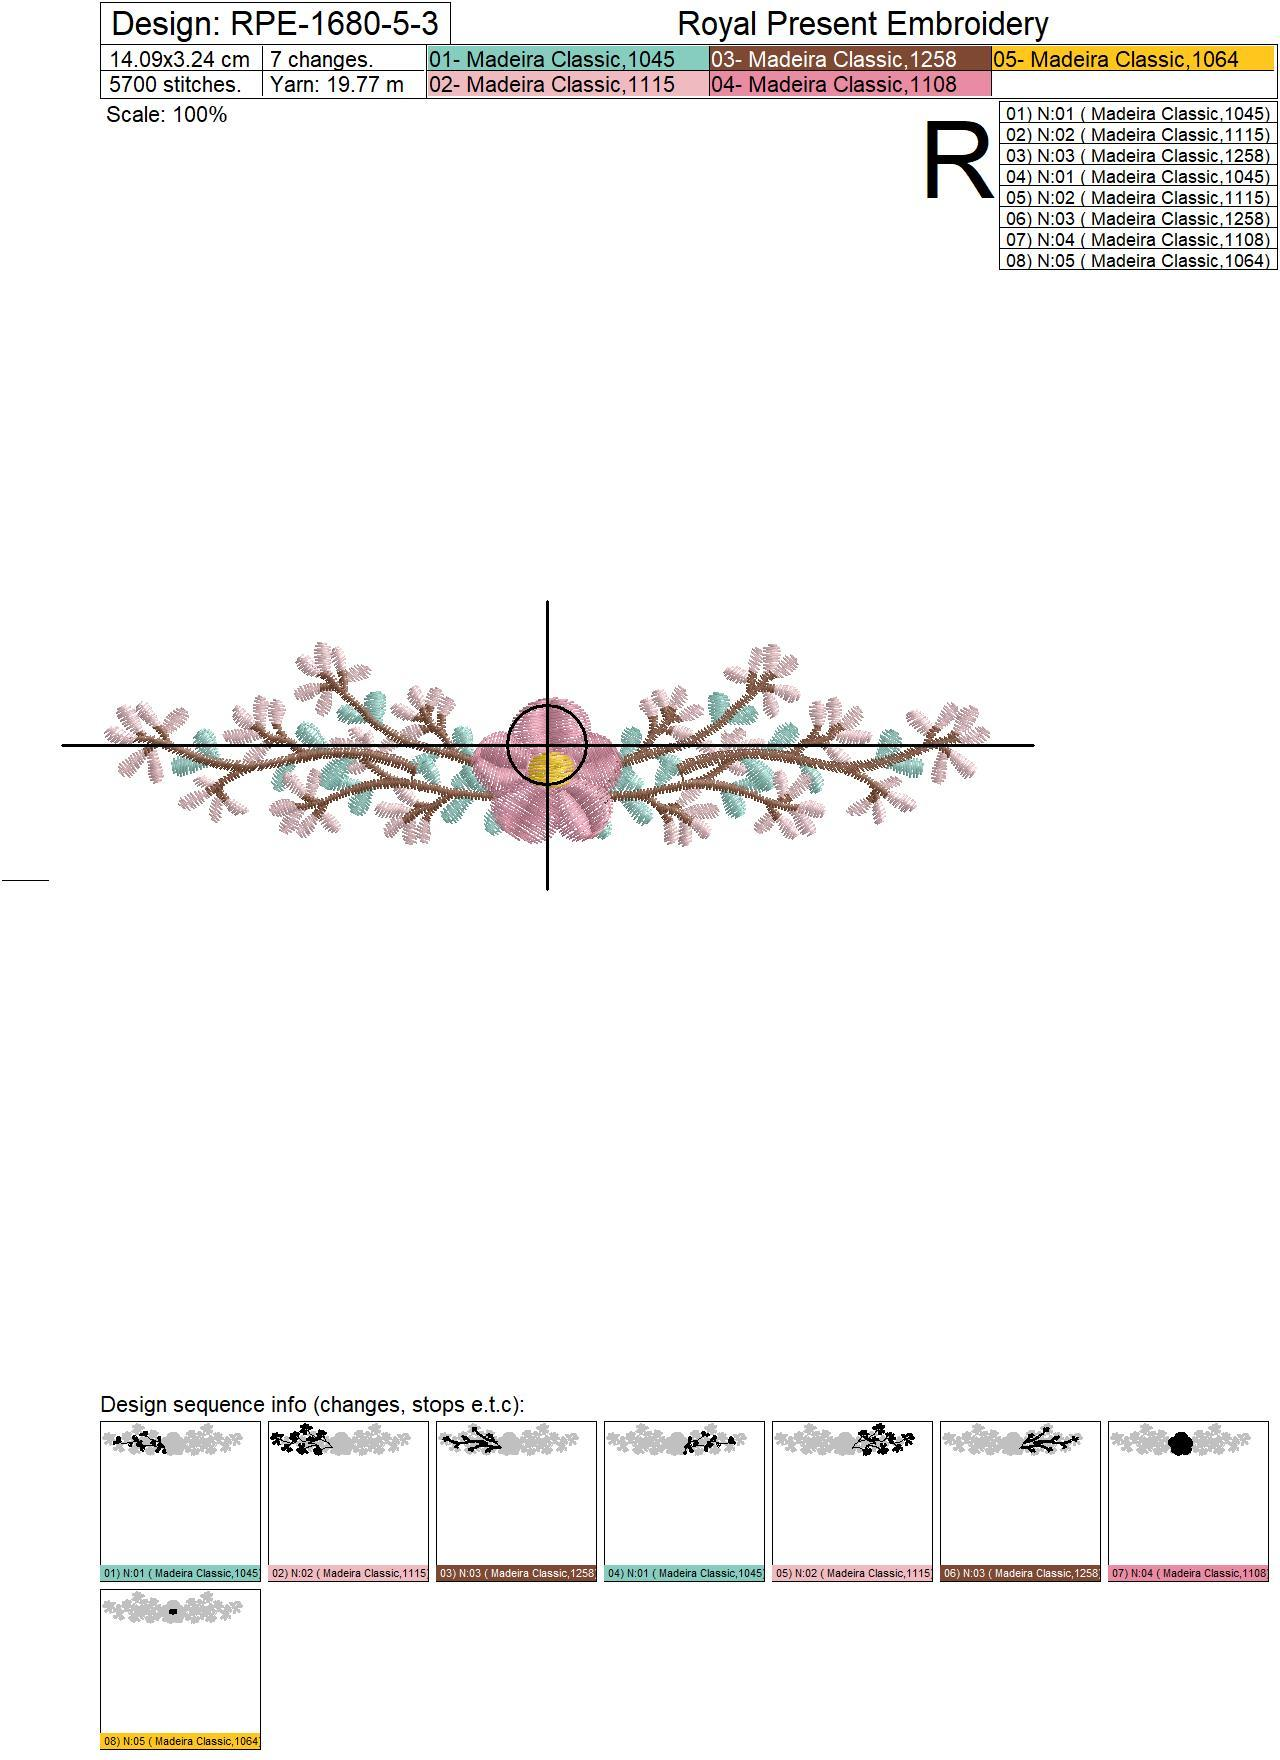 Mini Border Free Machine Embroidery Design - 3 sizes